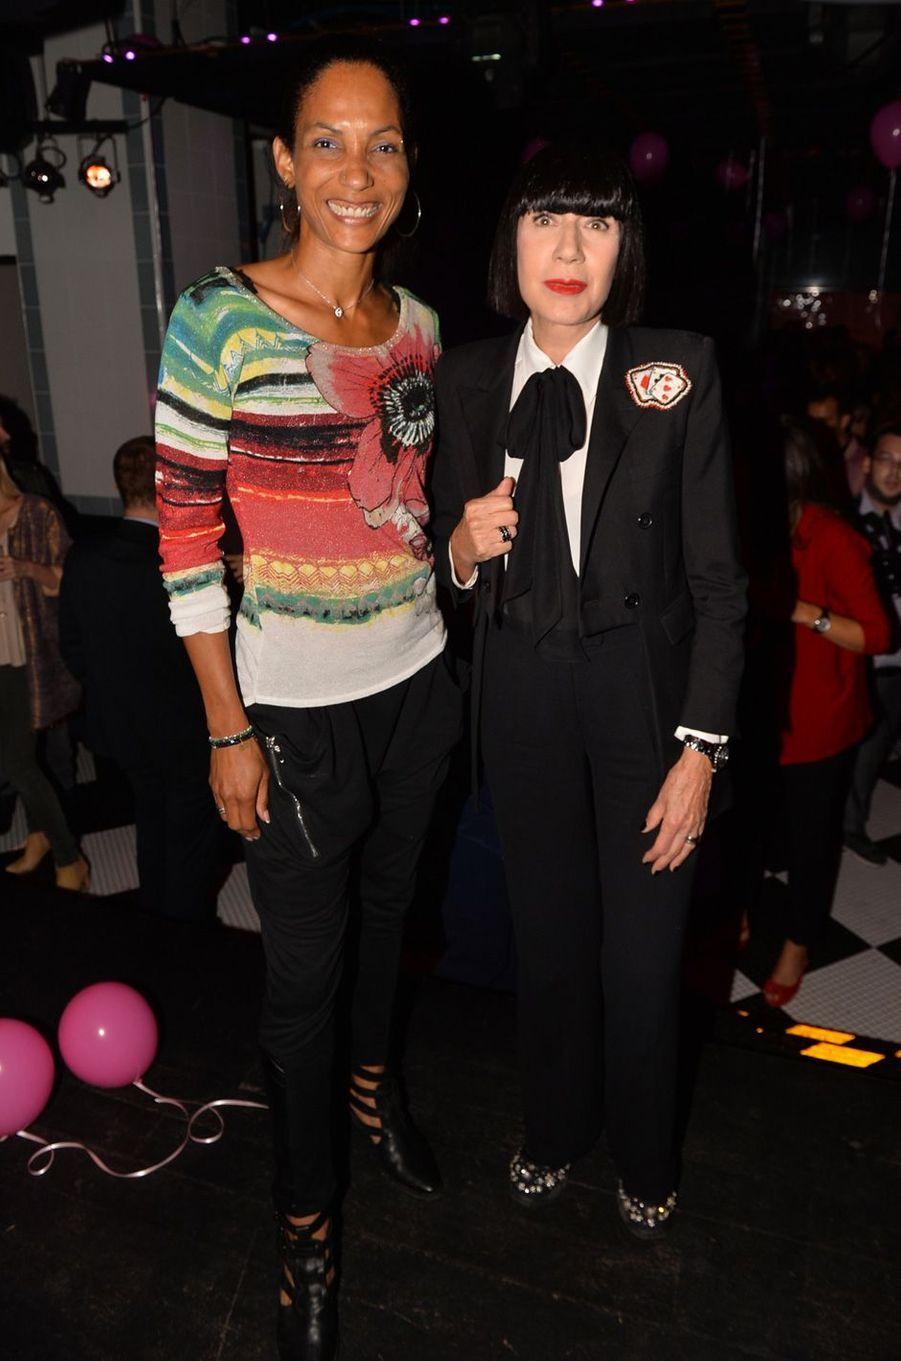 Collection Chantal Thomass - Damart : défilé de stars